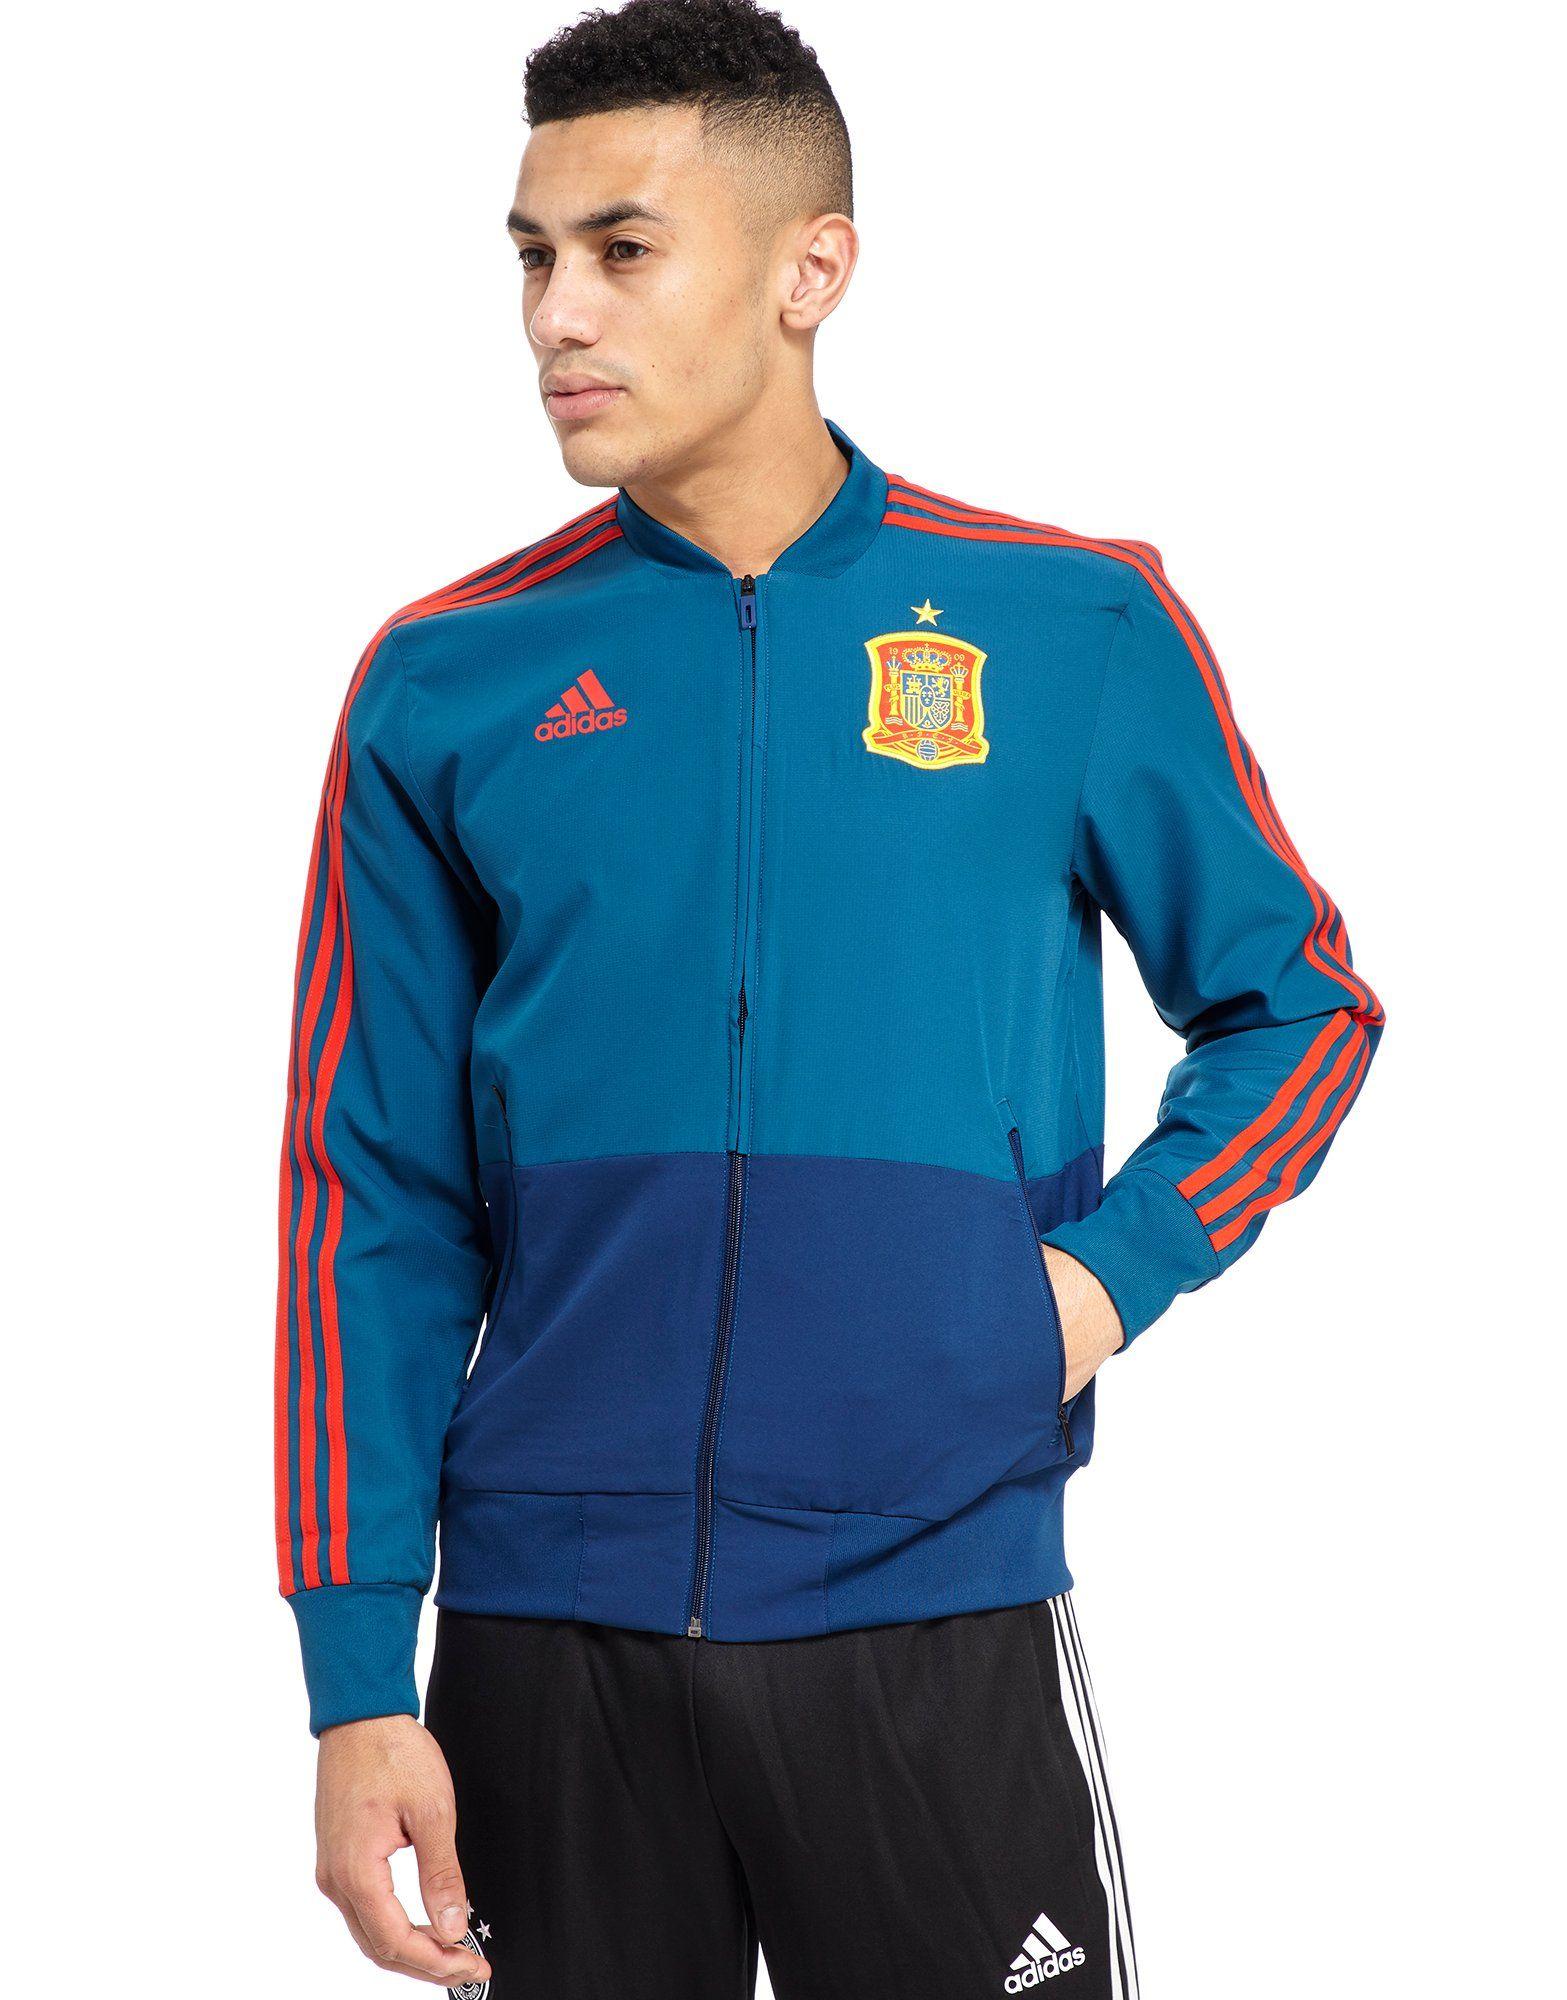 adidas spagna 2018 presentazione giacca jd sports